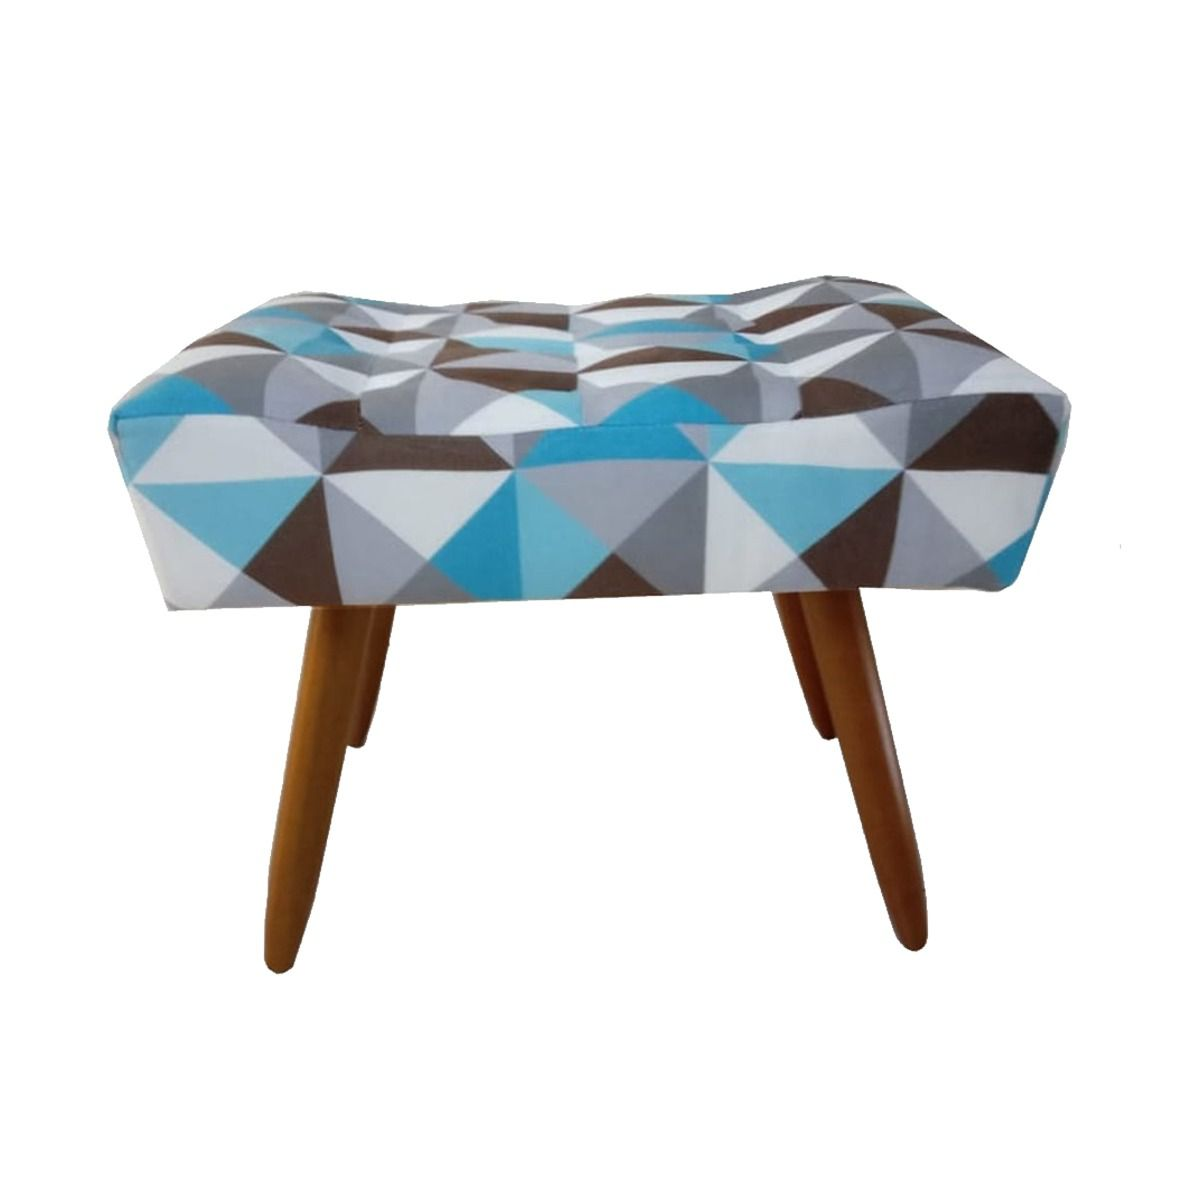 Kit 02 Poltrona Decorativa Nina com rodapé e Puff retangular Triângulo Azul - Bela Casa Shop